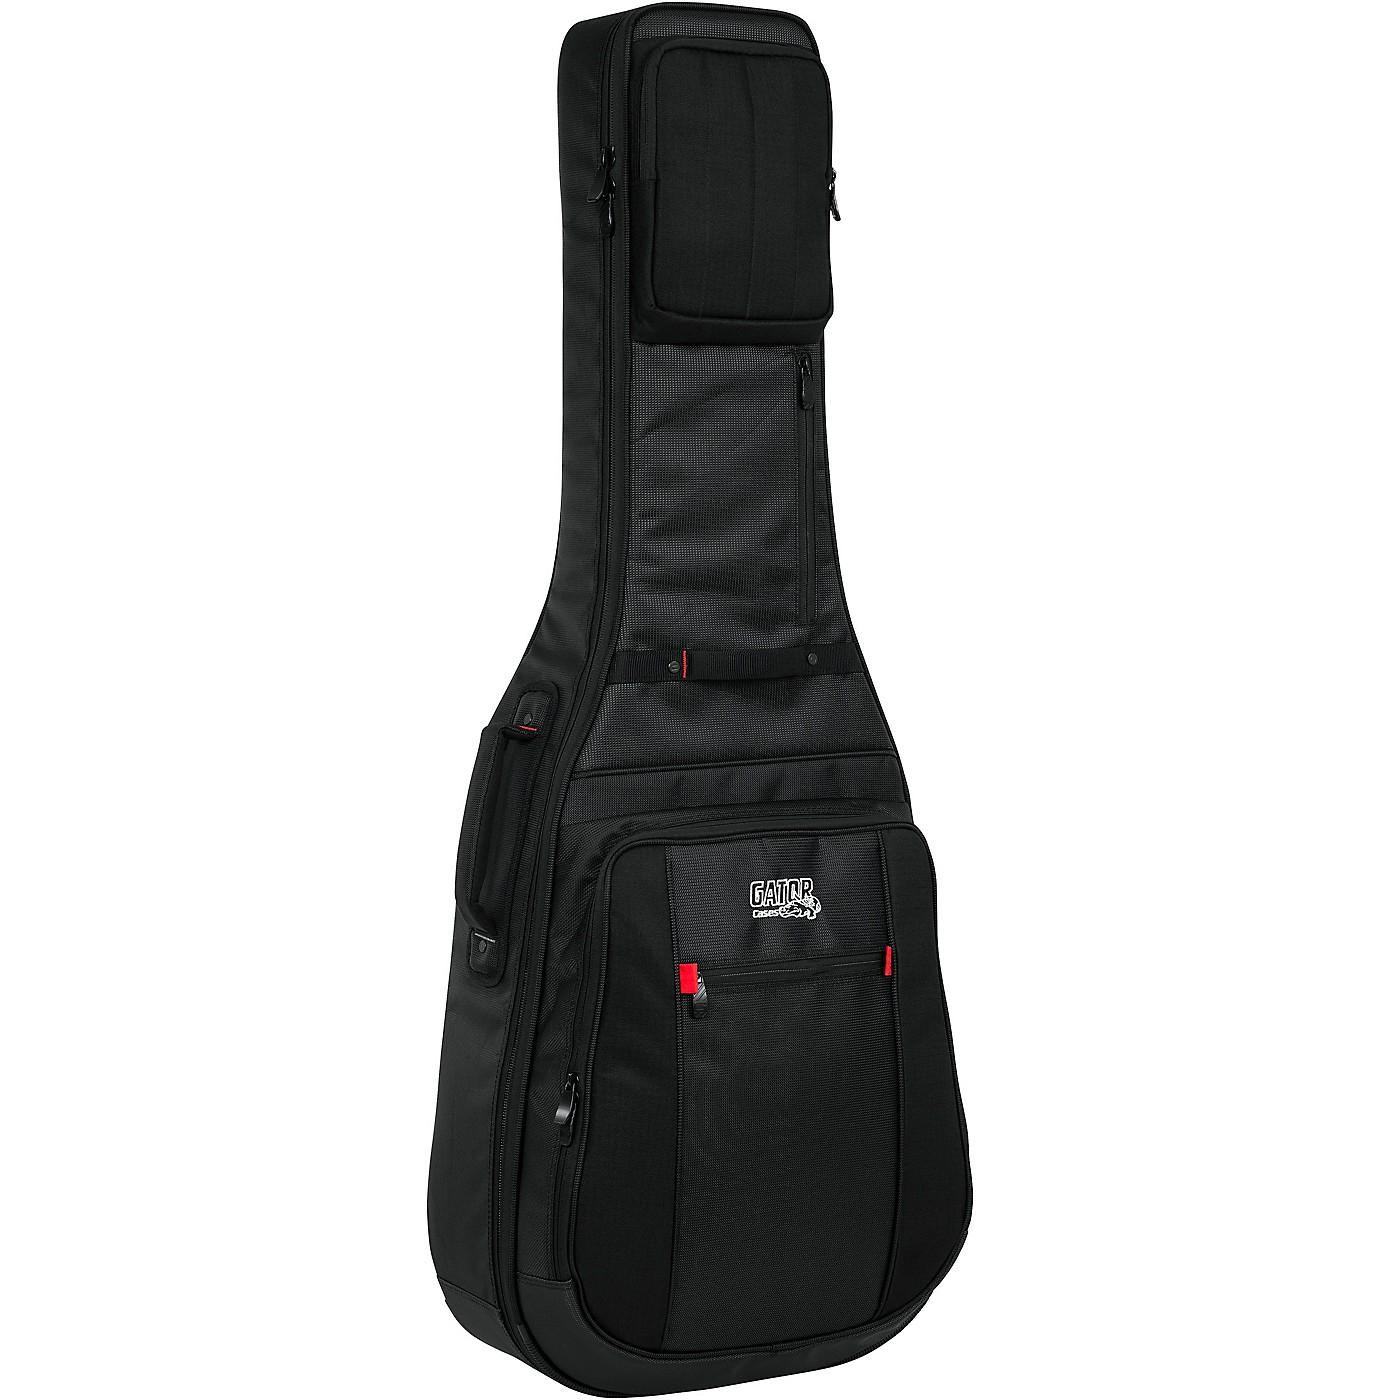 Gator G-PG ACOUSTIC ProGo Series Ultimate Gig Bag for Acoustic Guitar thumbnail